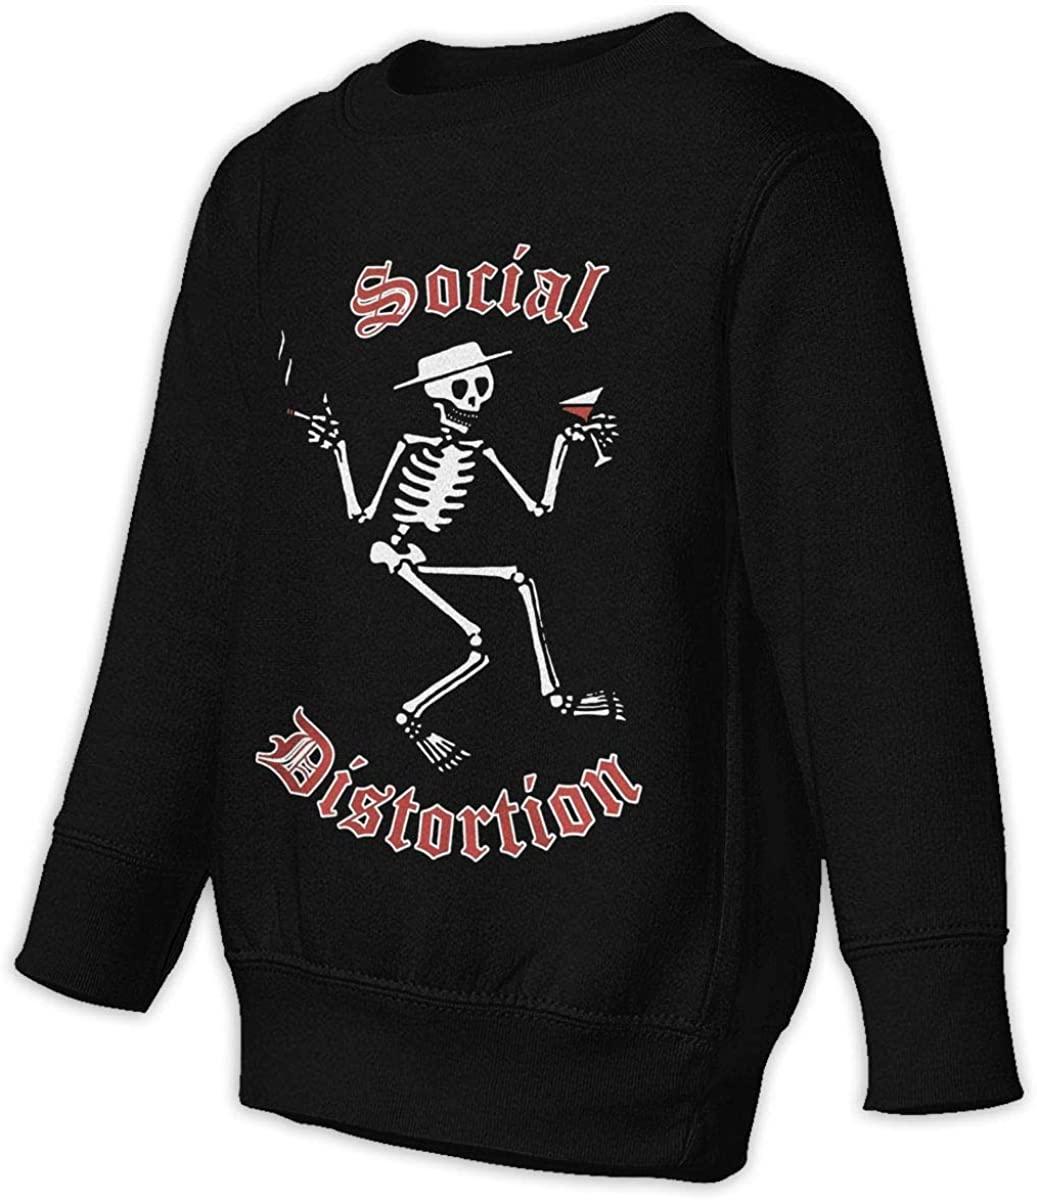 CZXVAFV Social Distortion Skelly Logo Unisex Sweatshirt Youth Boy and Girls Pullover Sweatshirt